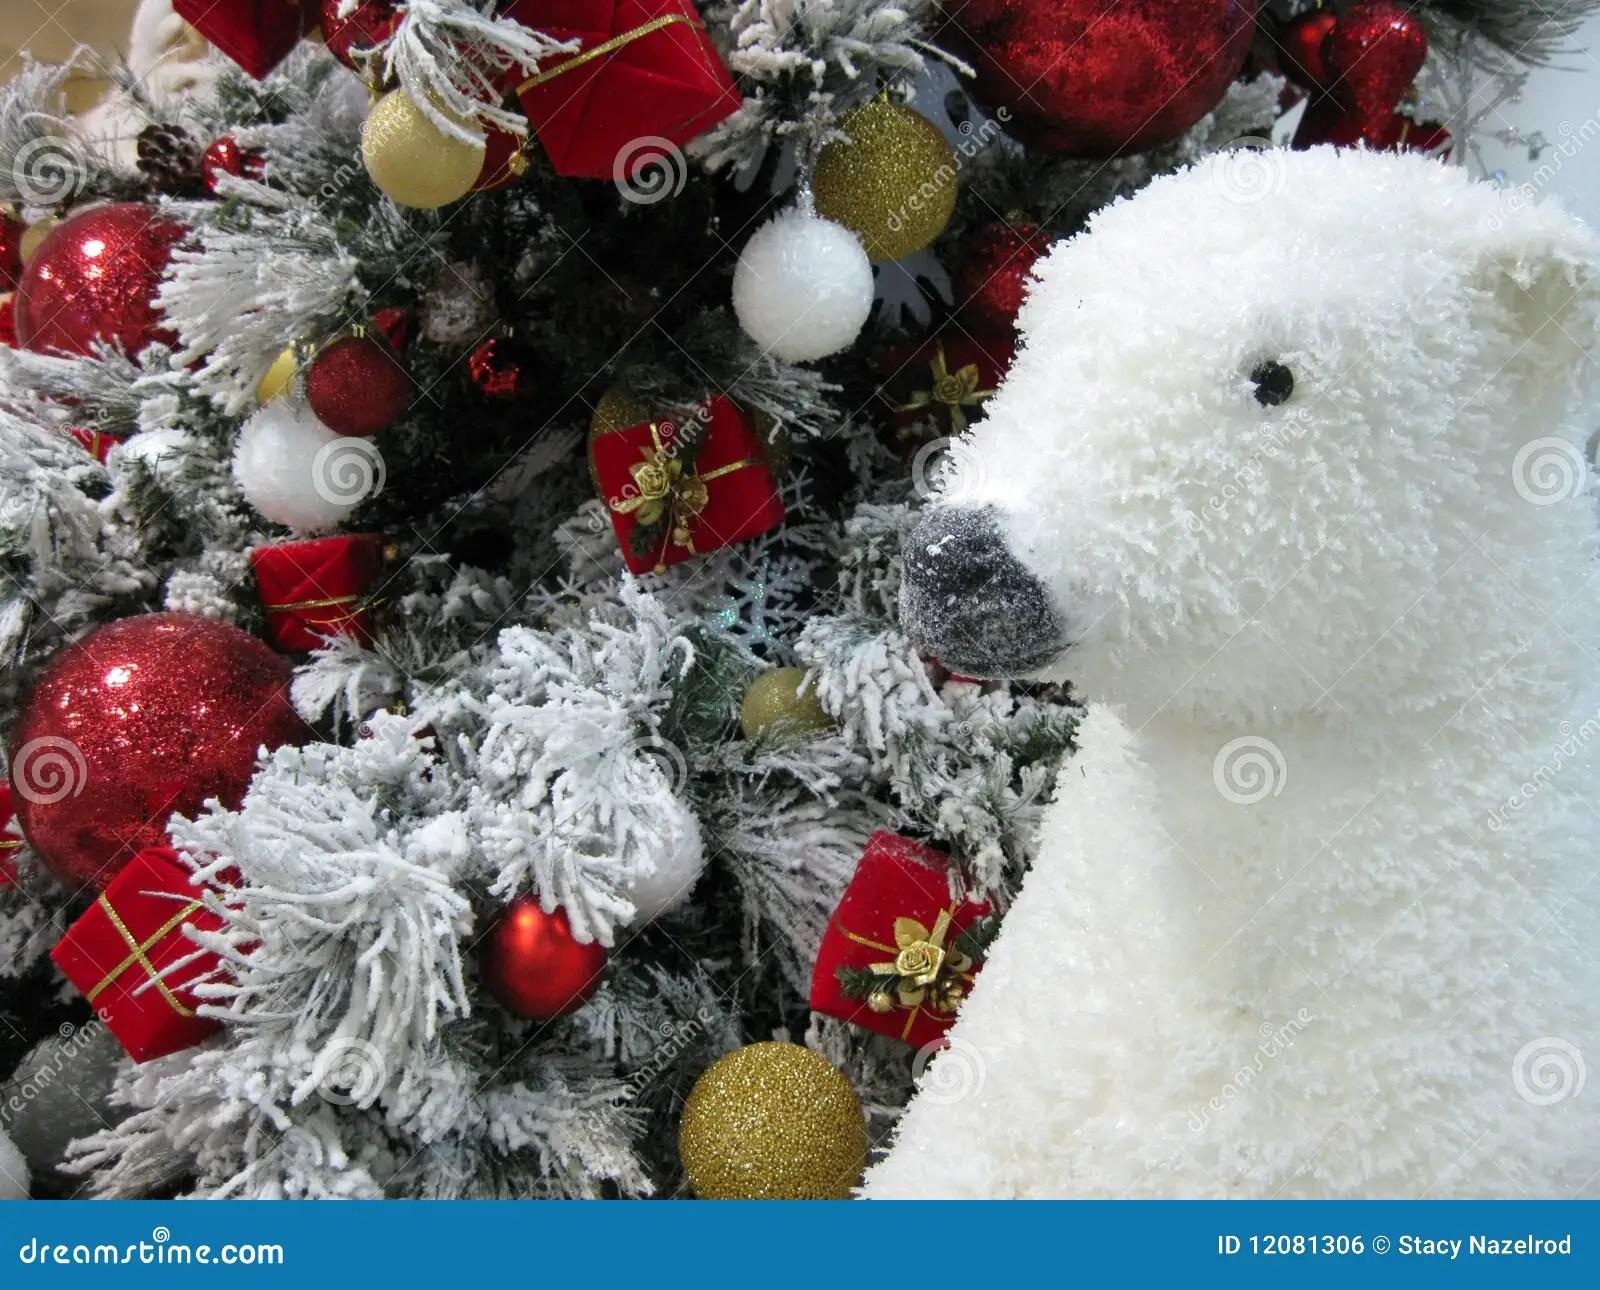 Polar Bear And Christmas Tree Stock Photo Image 12081306